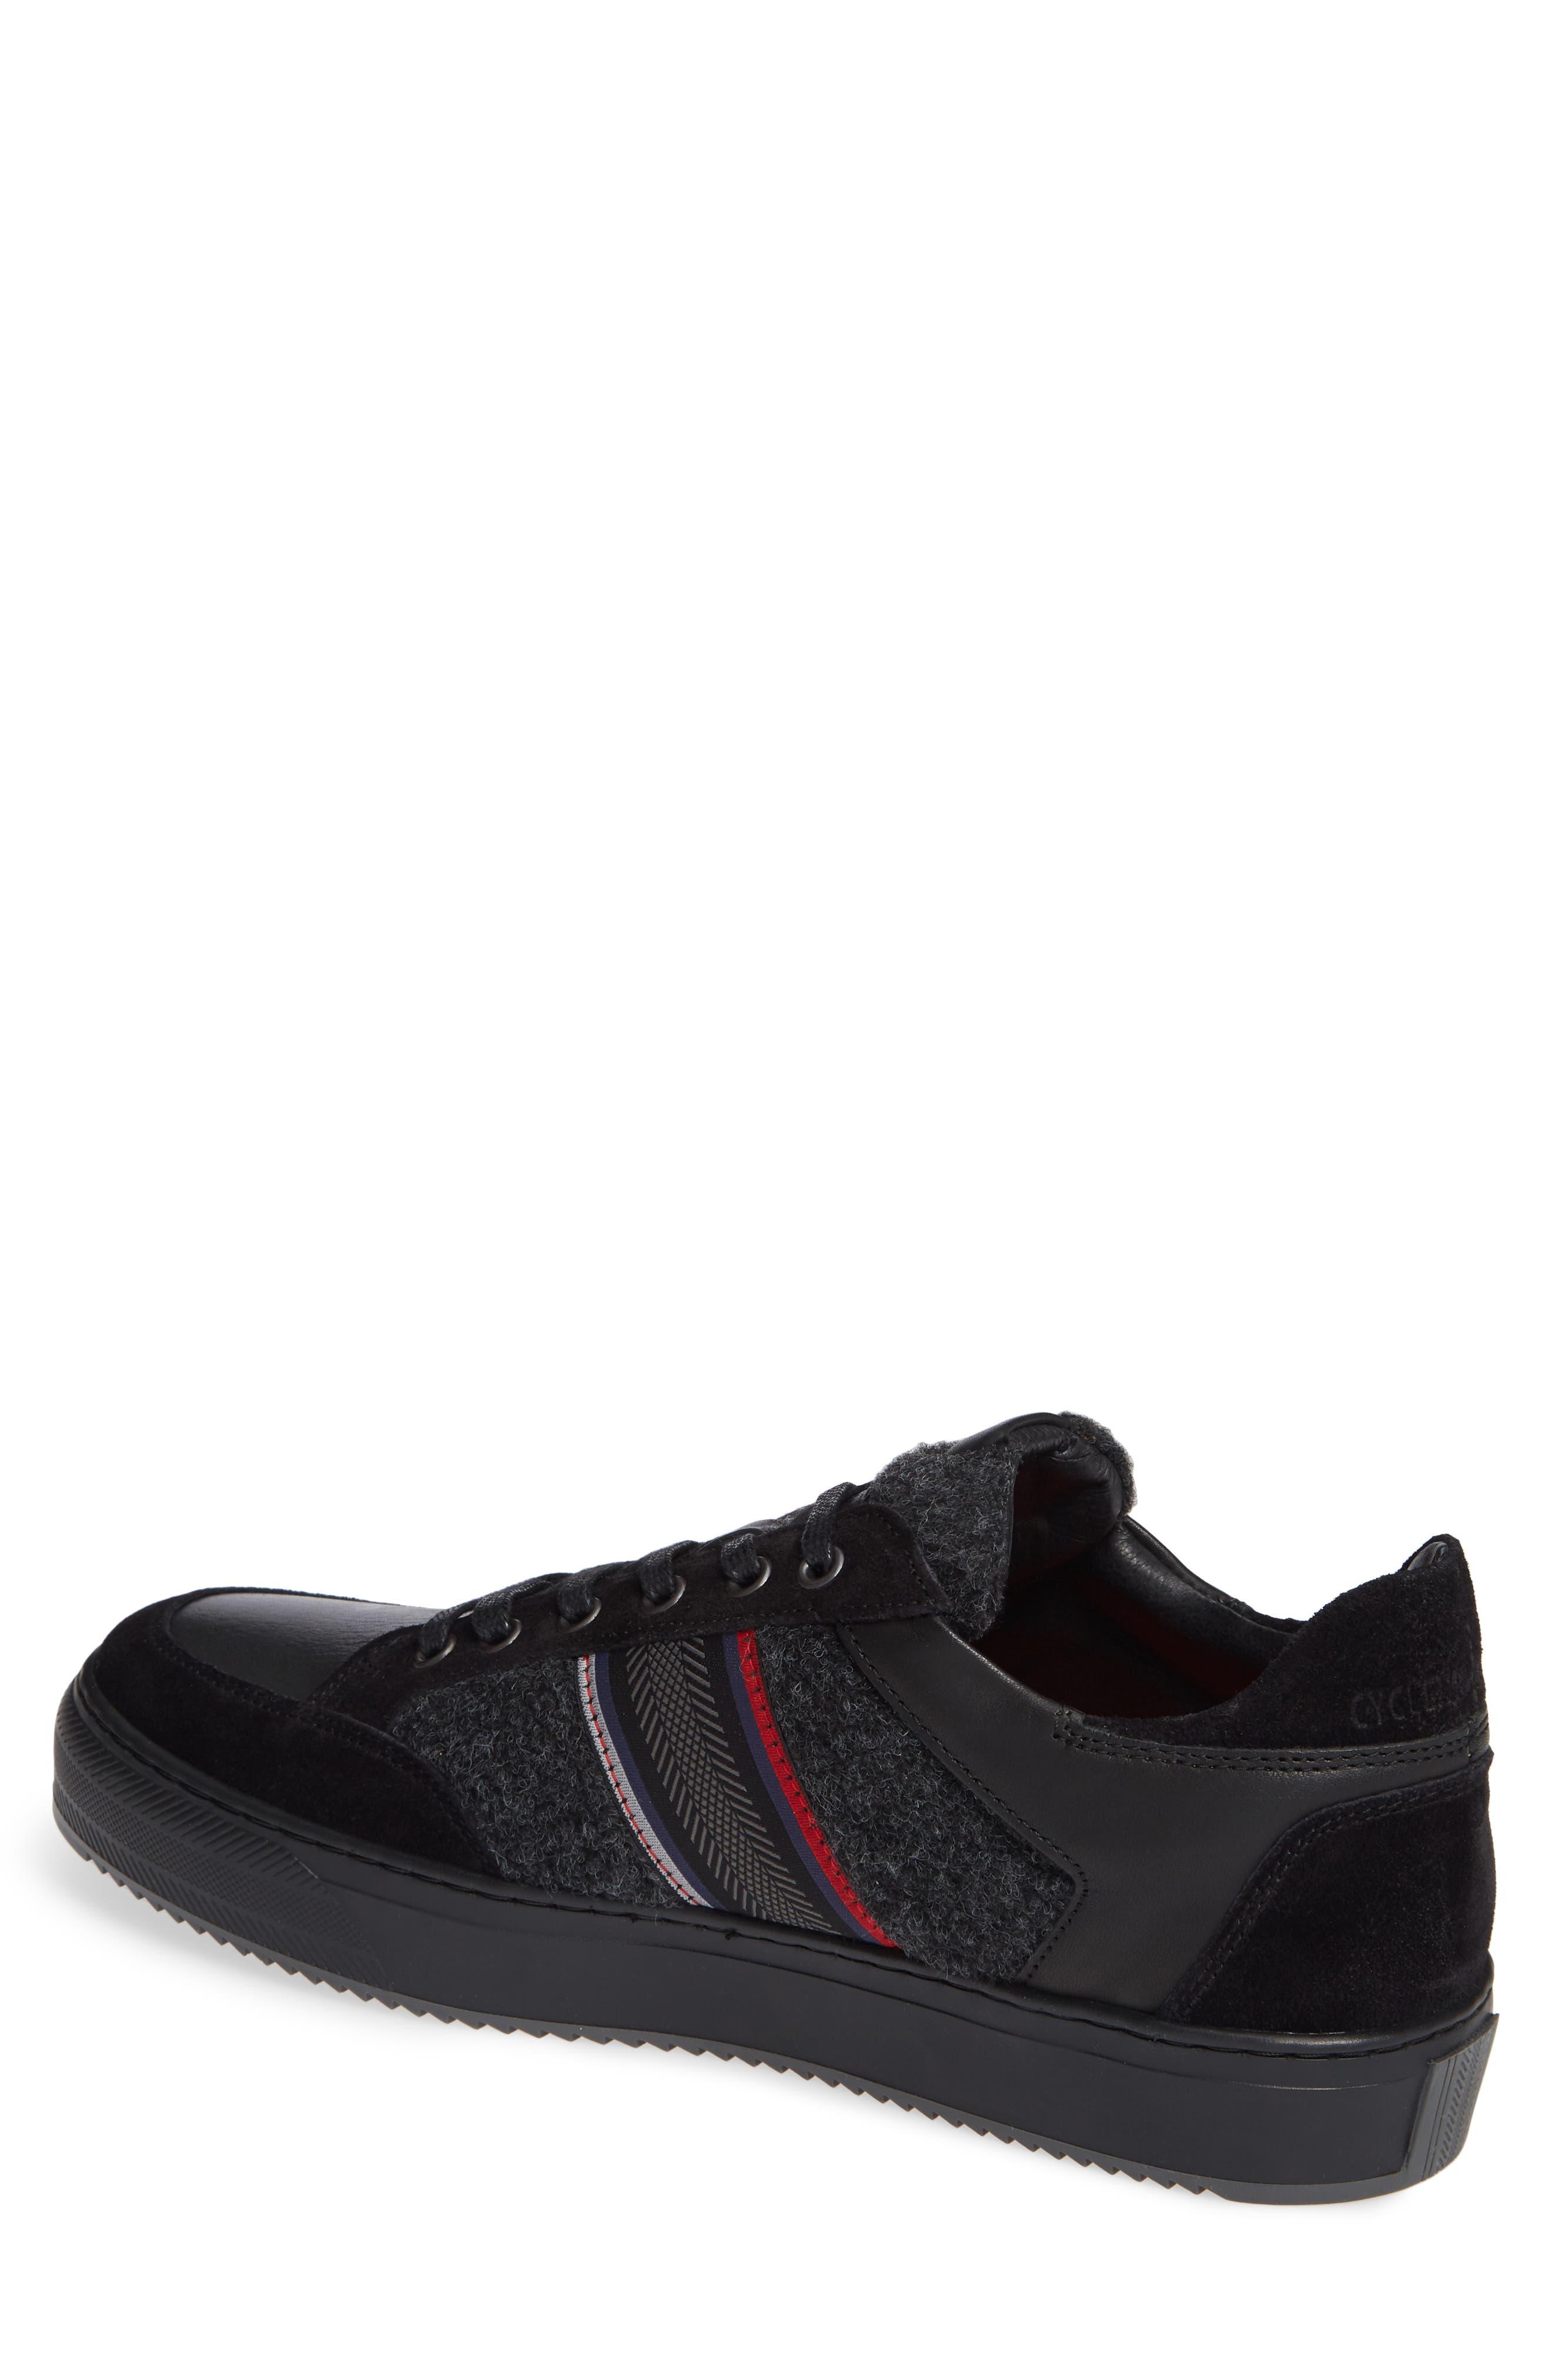 Poggio Sneaker,                             Alternate thumbnail 2, color,                             BLACK